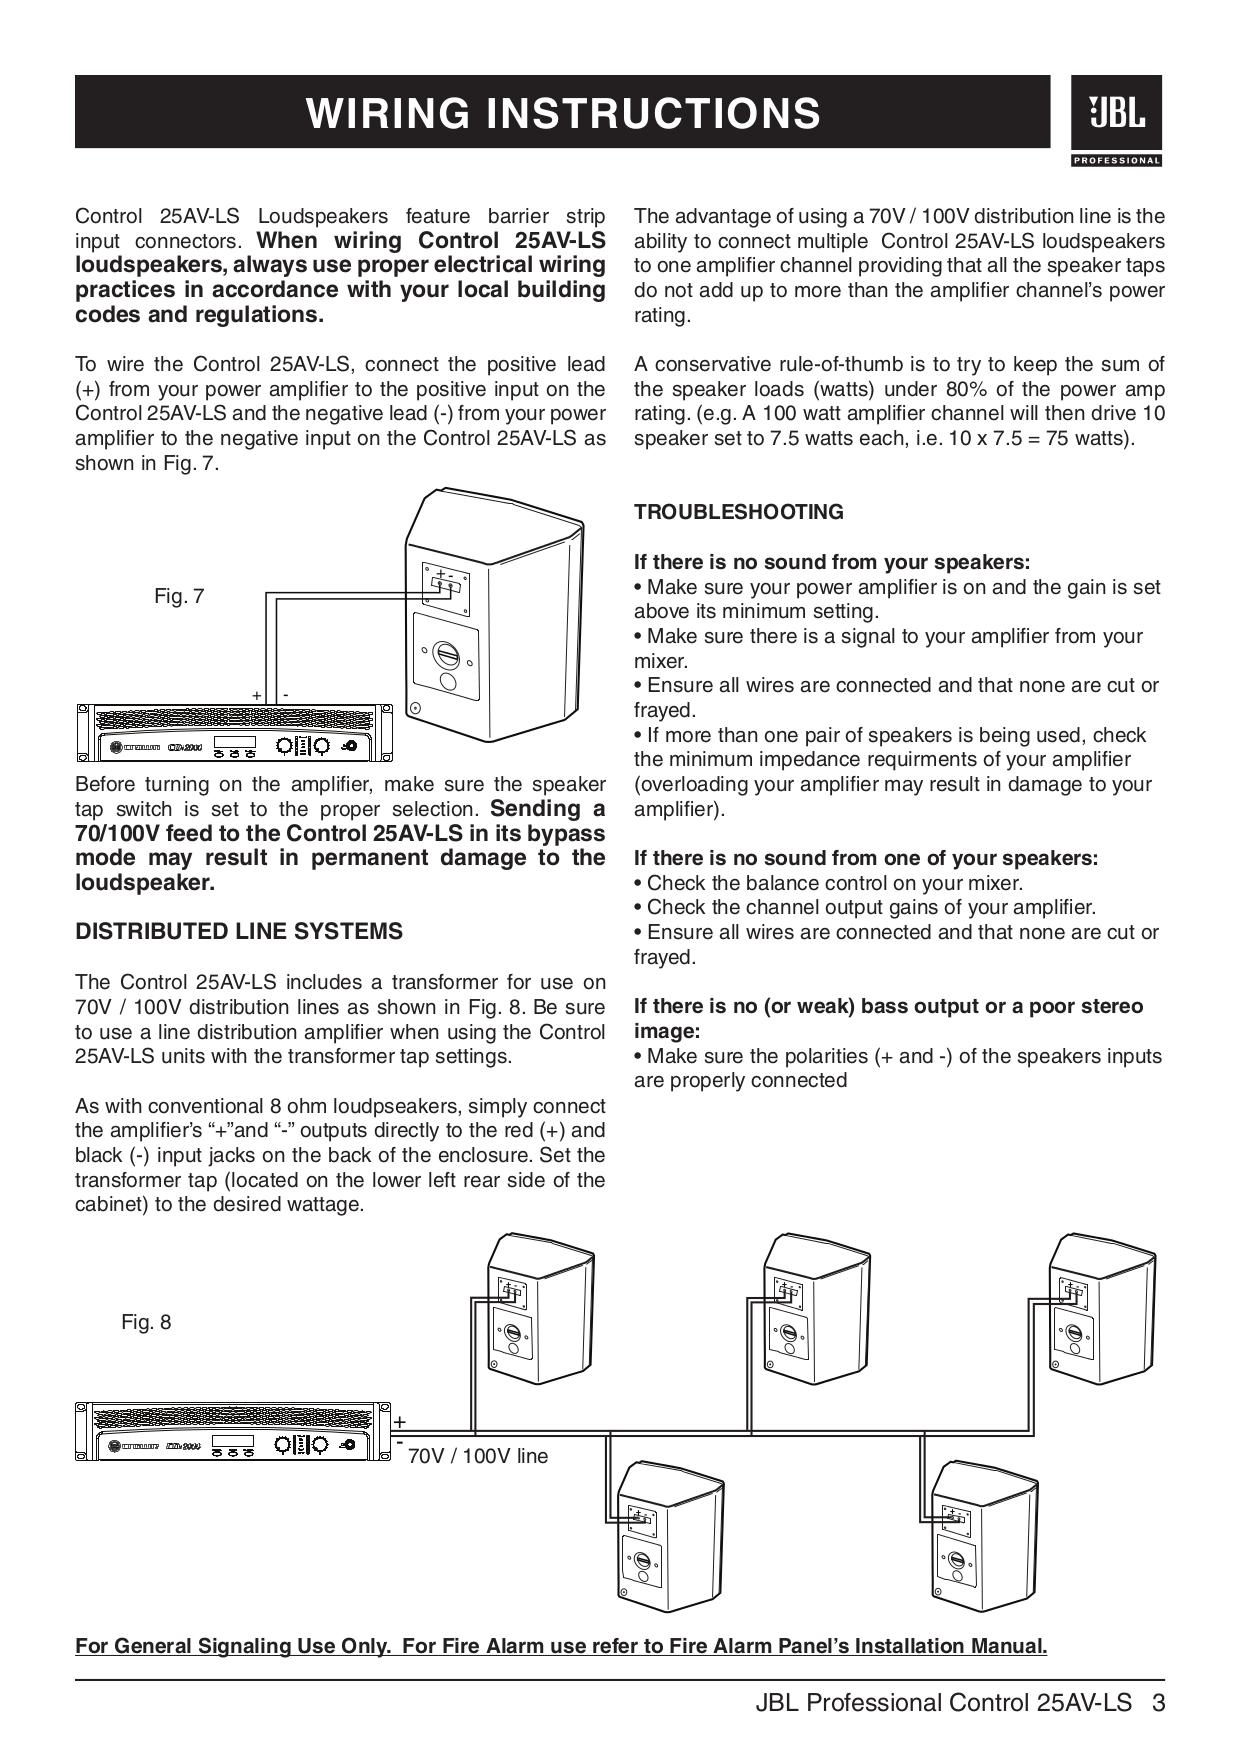 pdf manual for jbl speaker control control 25 rh umlib com JBL Control 25 Owner's Manual JBL Control 25Av Manual